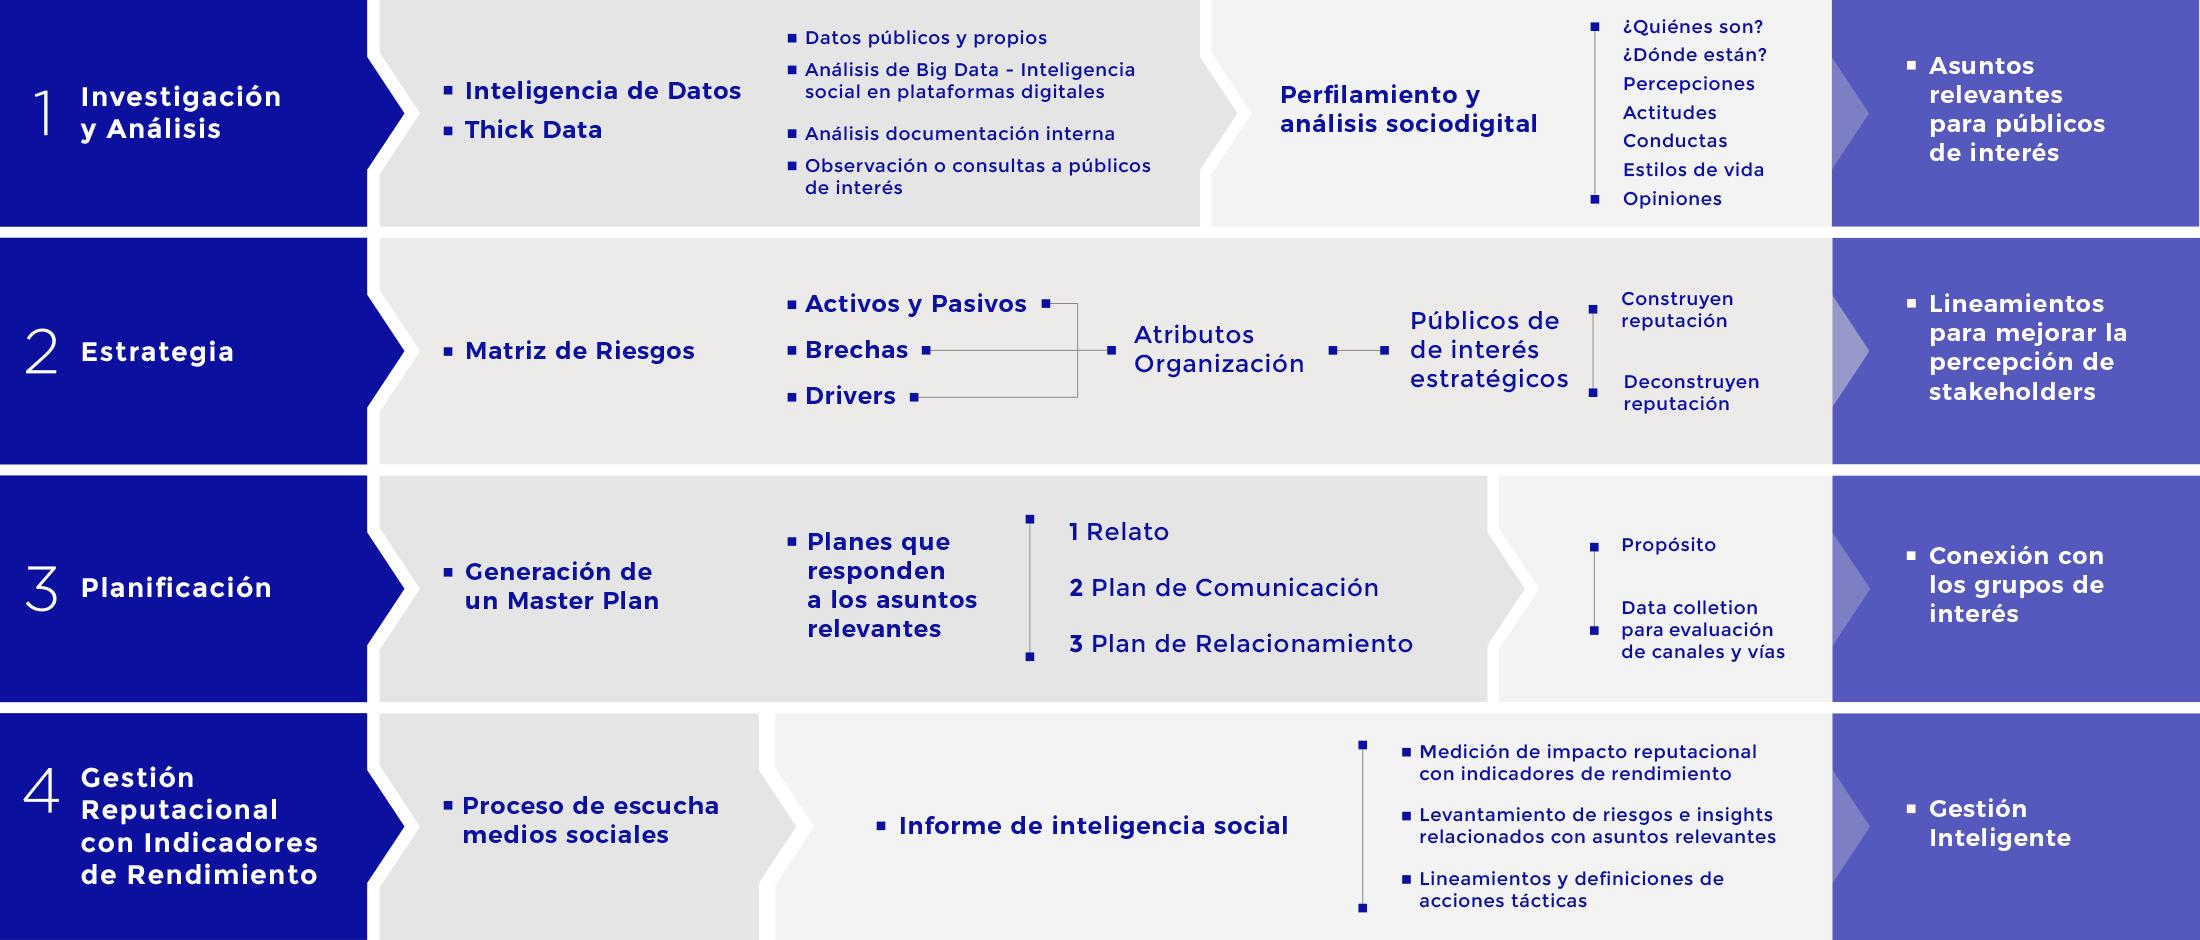 Inteligencia Reputacional